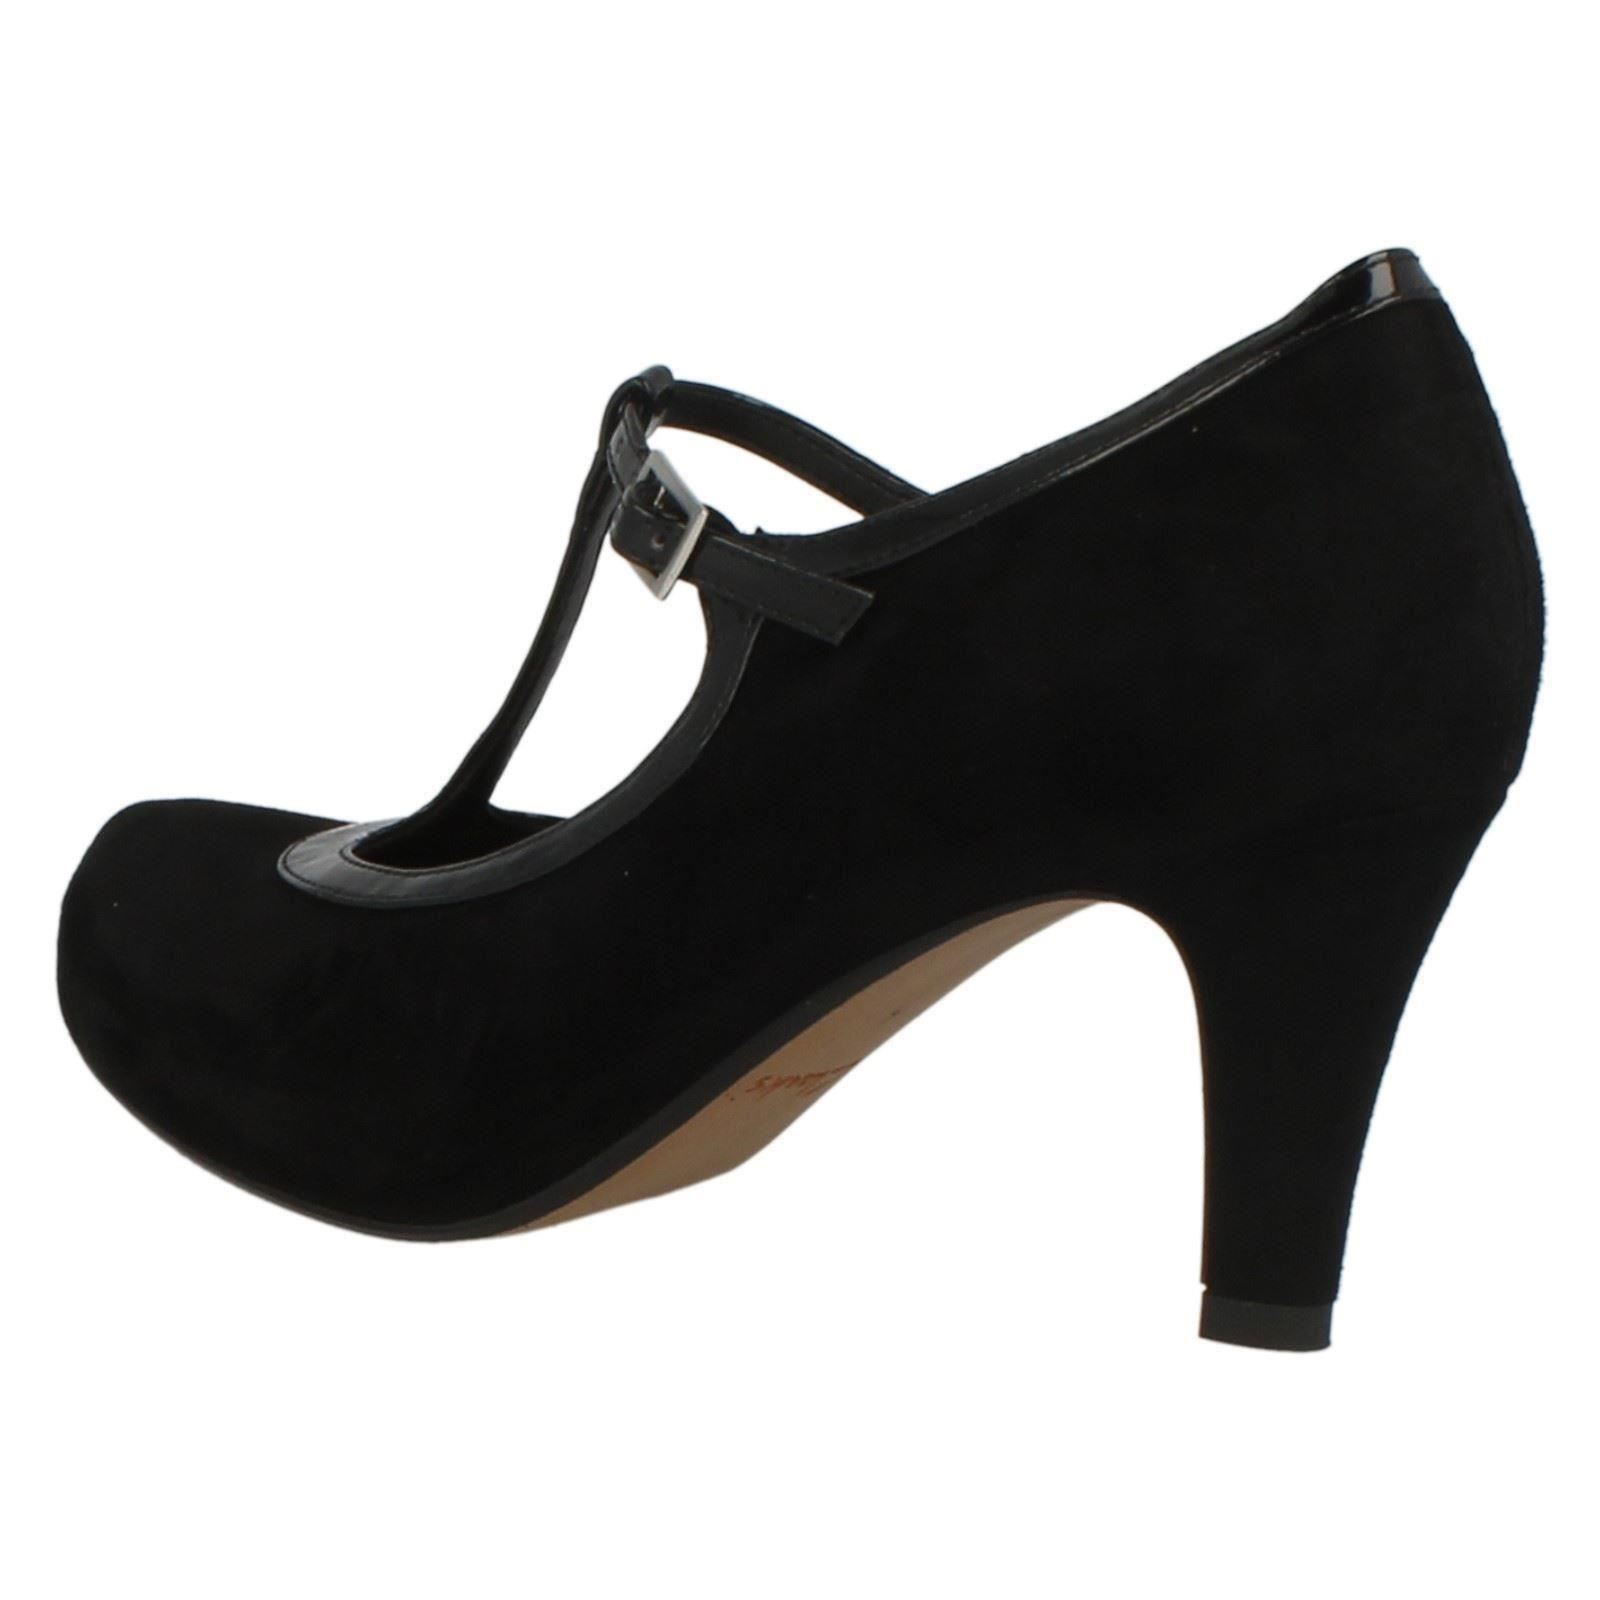 Deichman Heeled Shoes